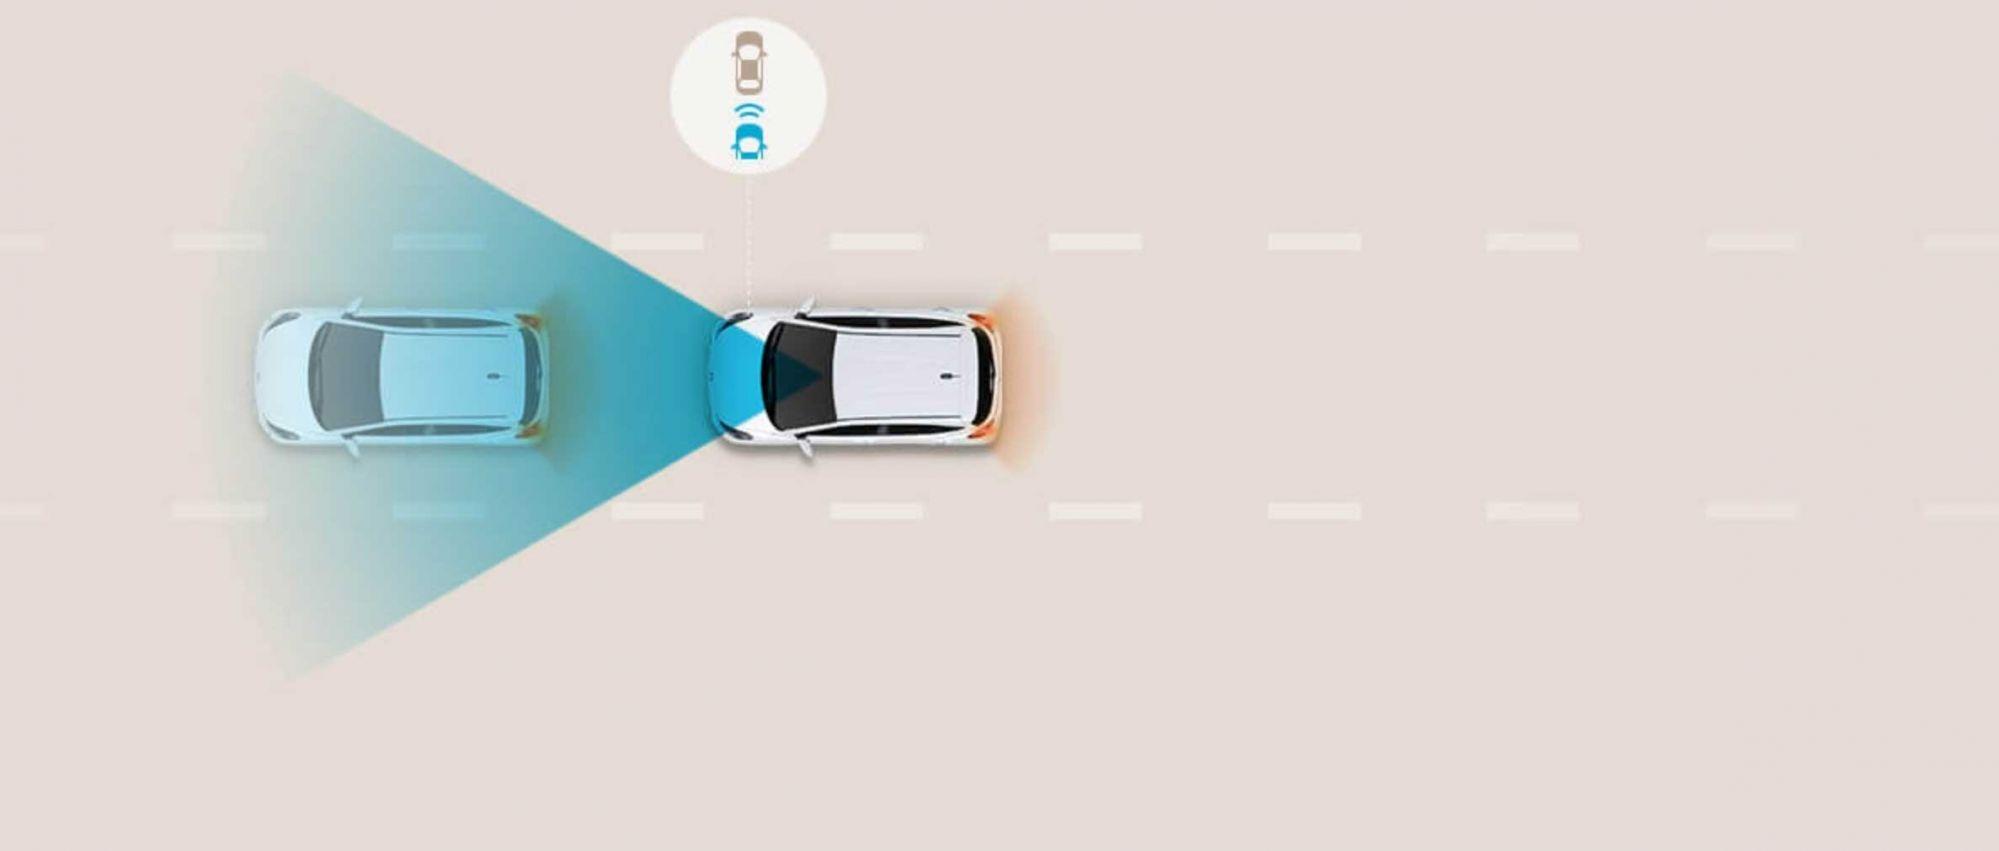 Sistem za izbegavanje sudara pri kretanju unapred (FCA)